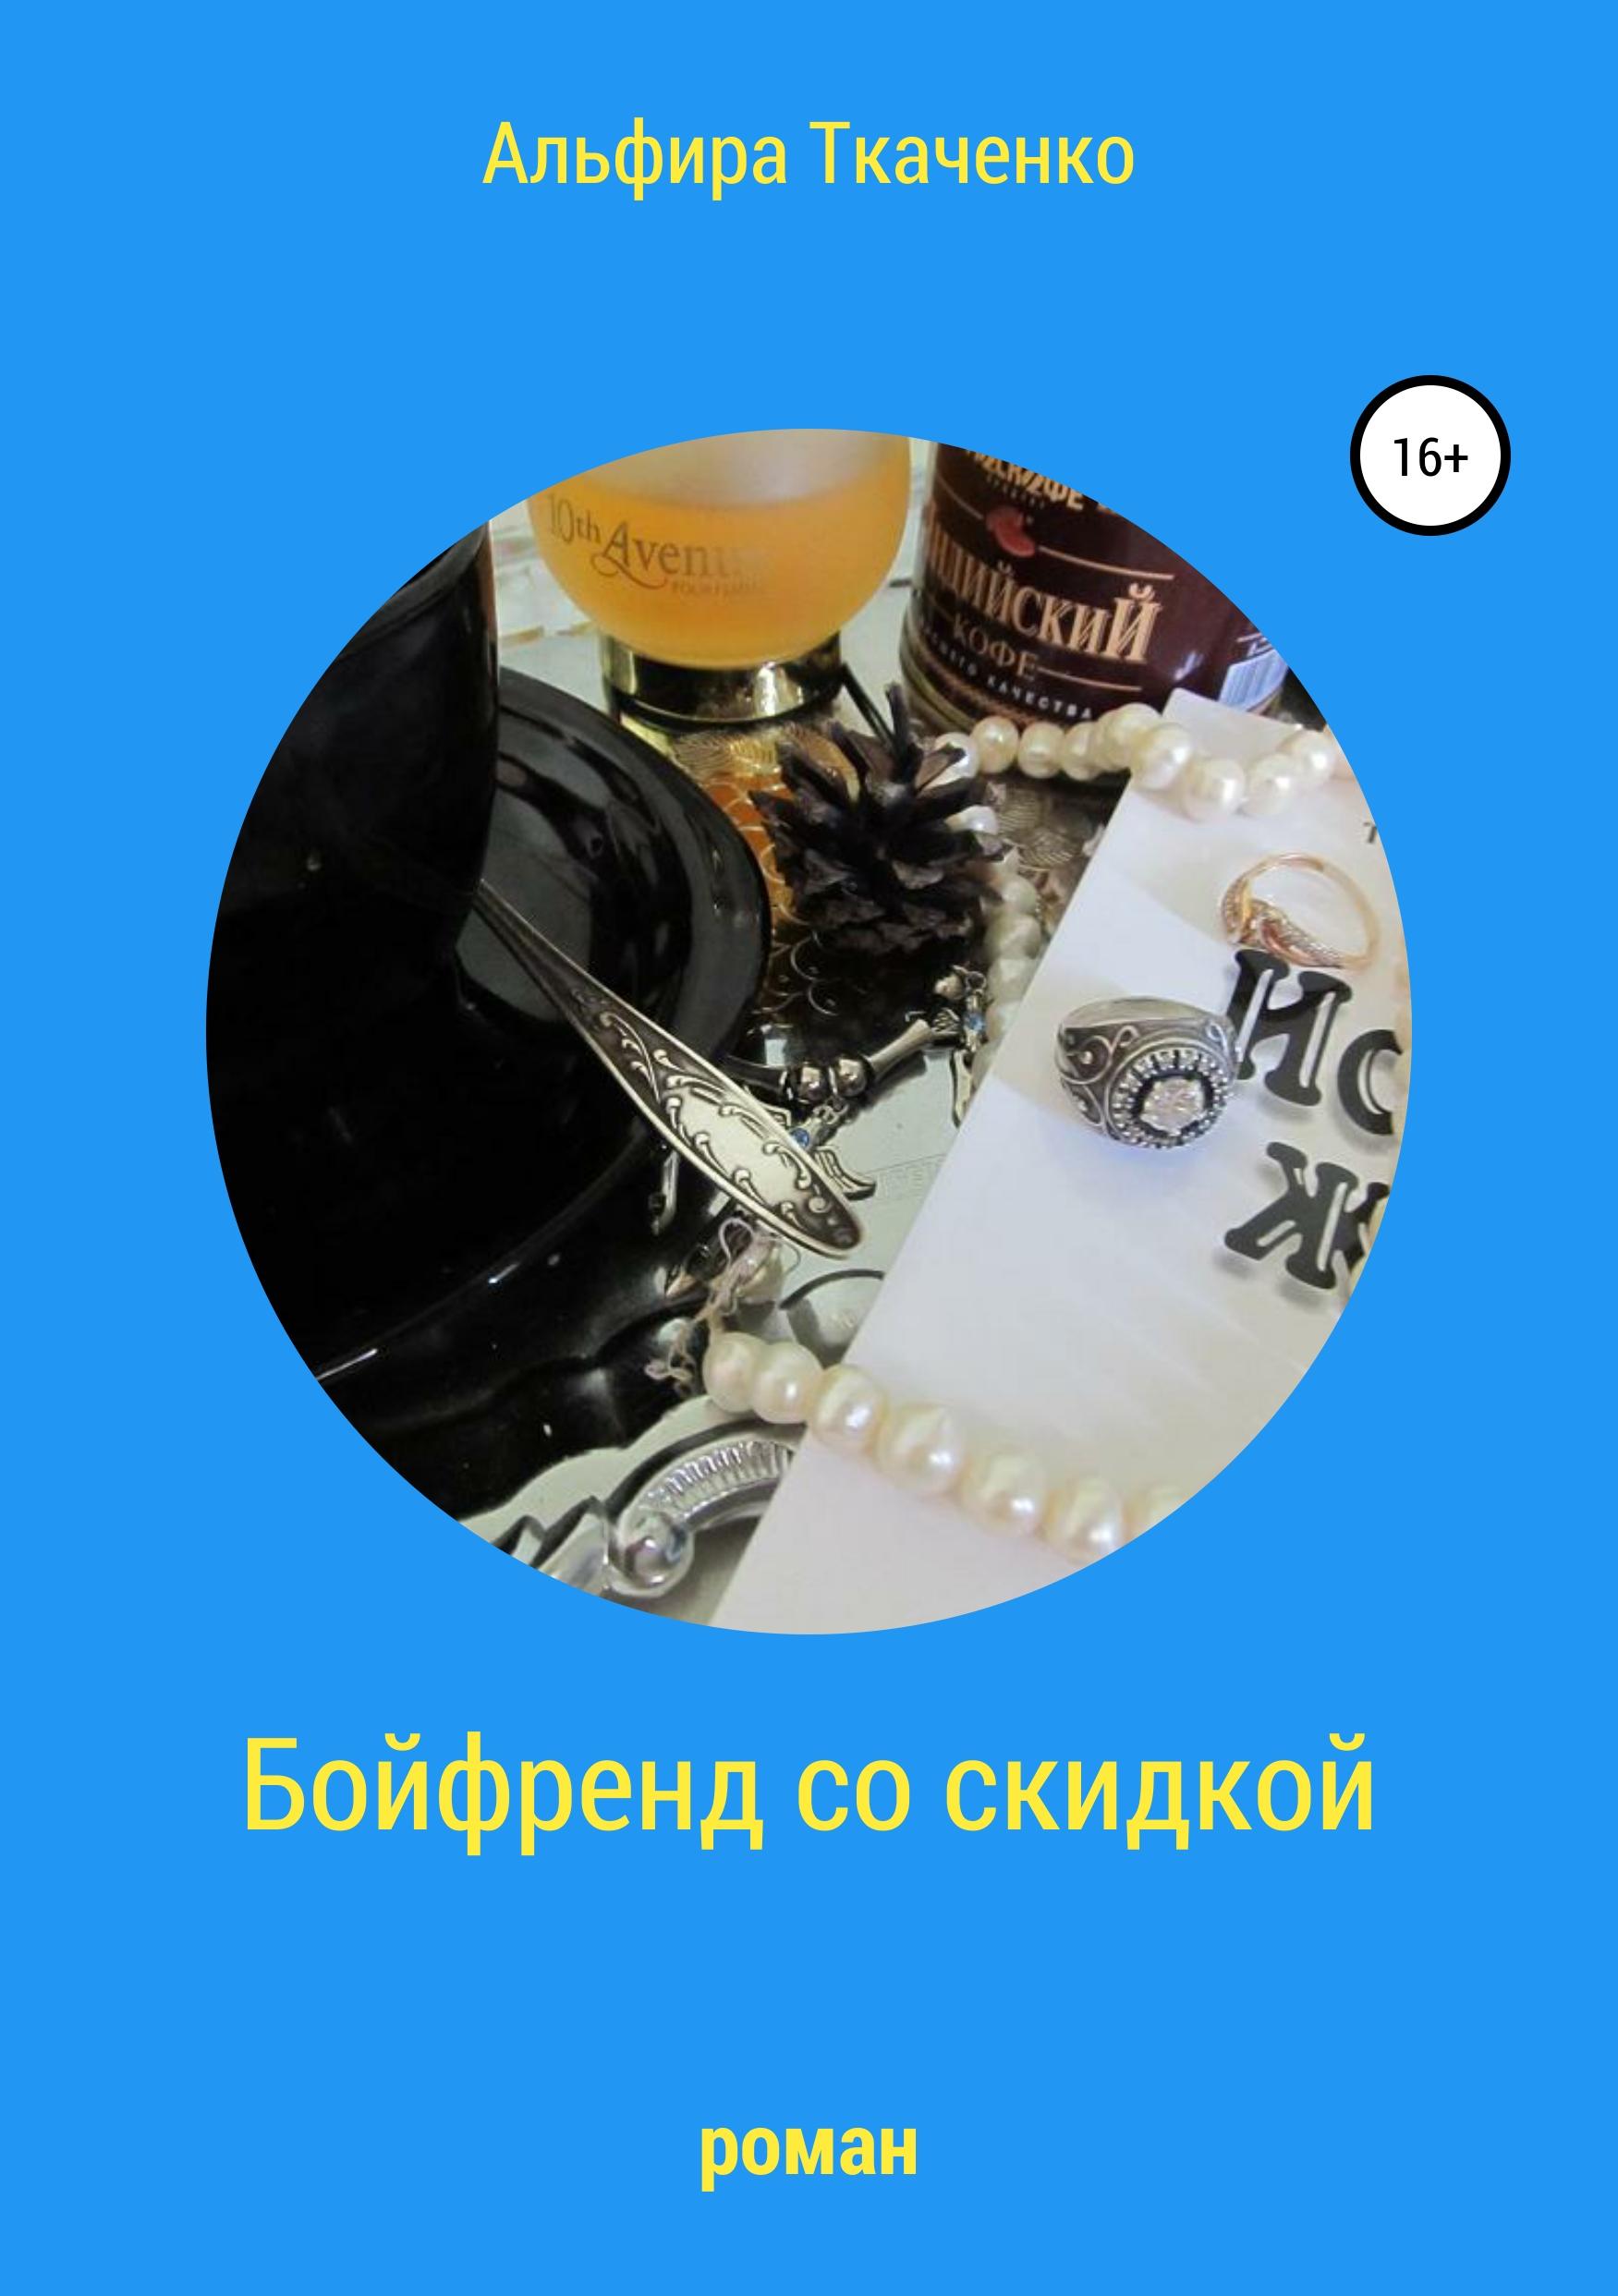 все цены на Альфира Федоровна Ткаченко Бойфренд со скидкой онлайн